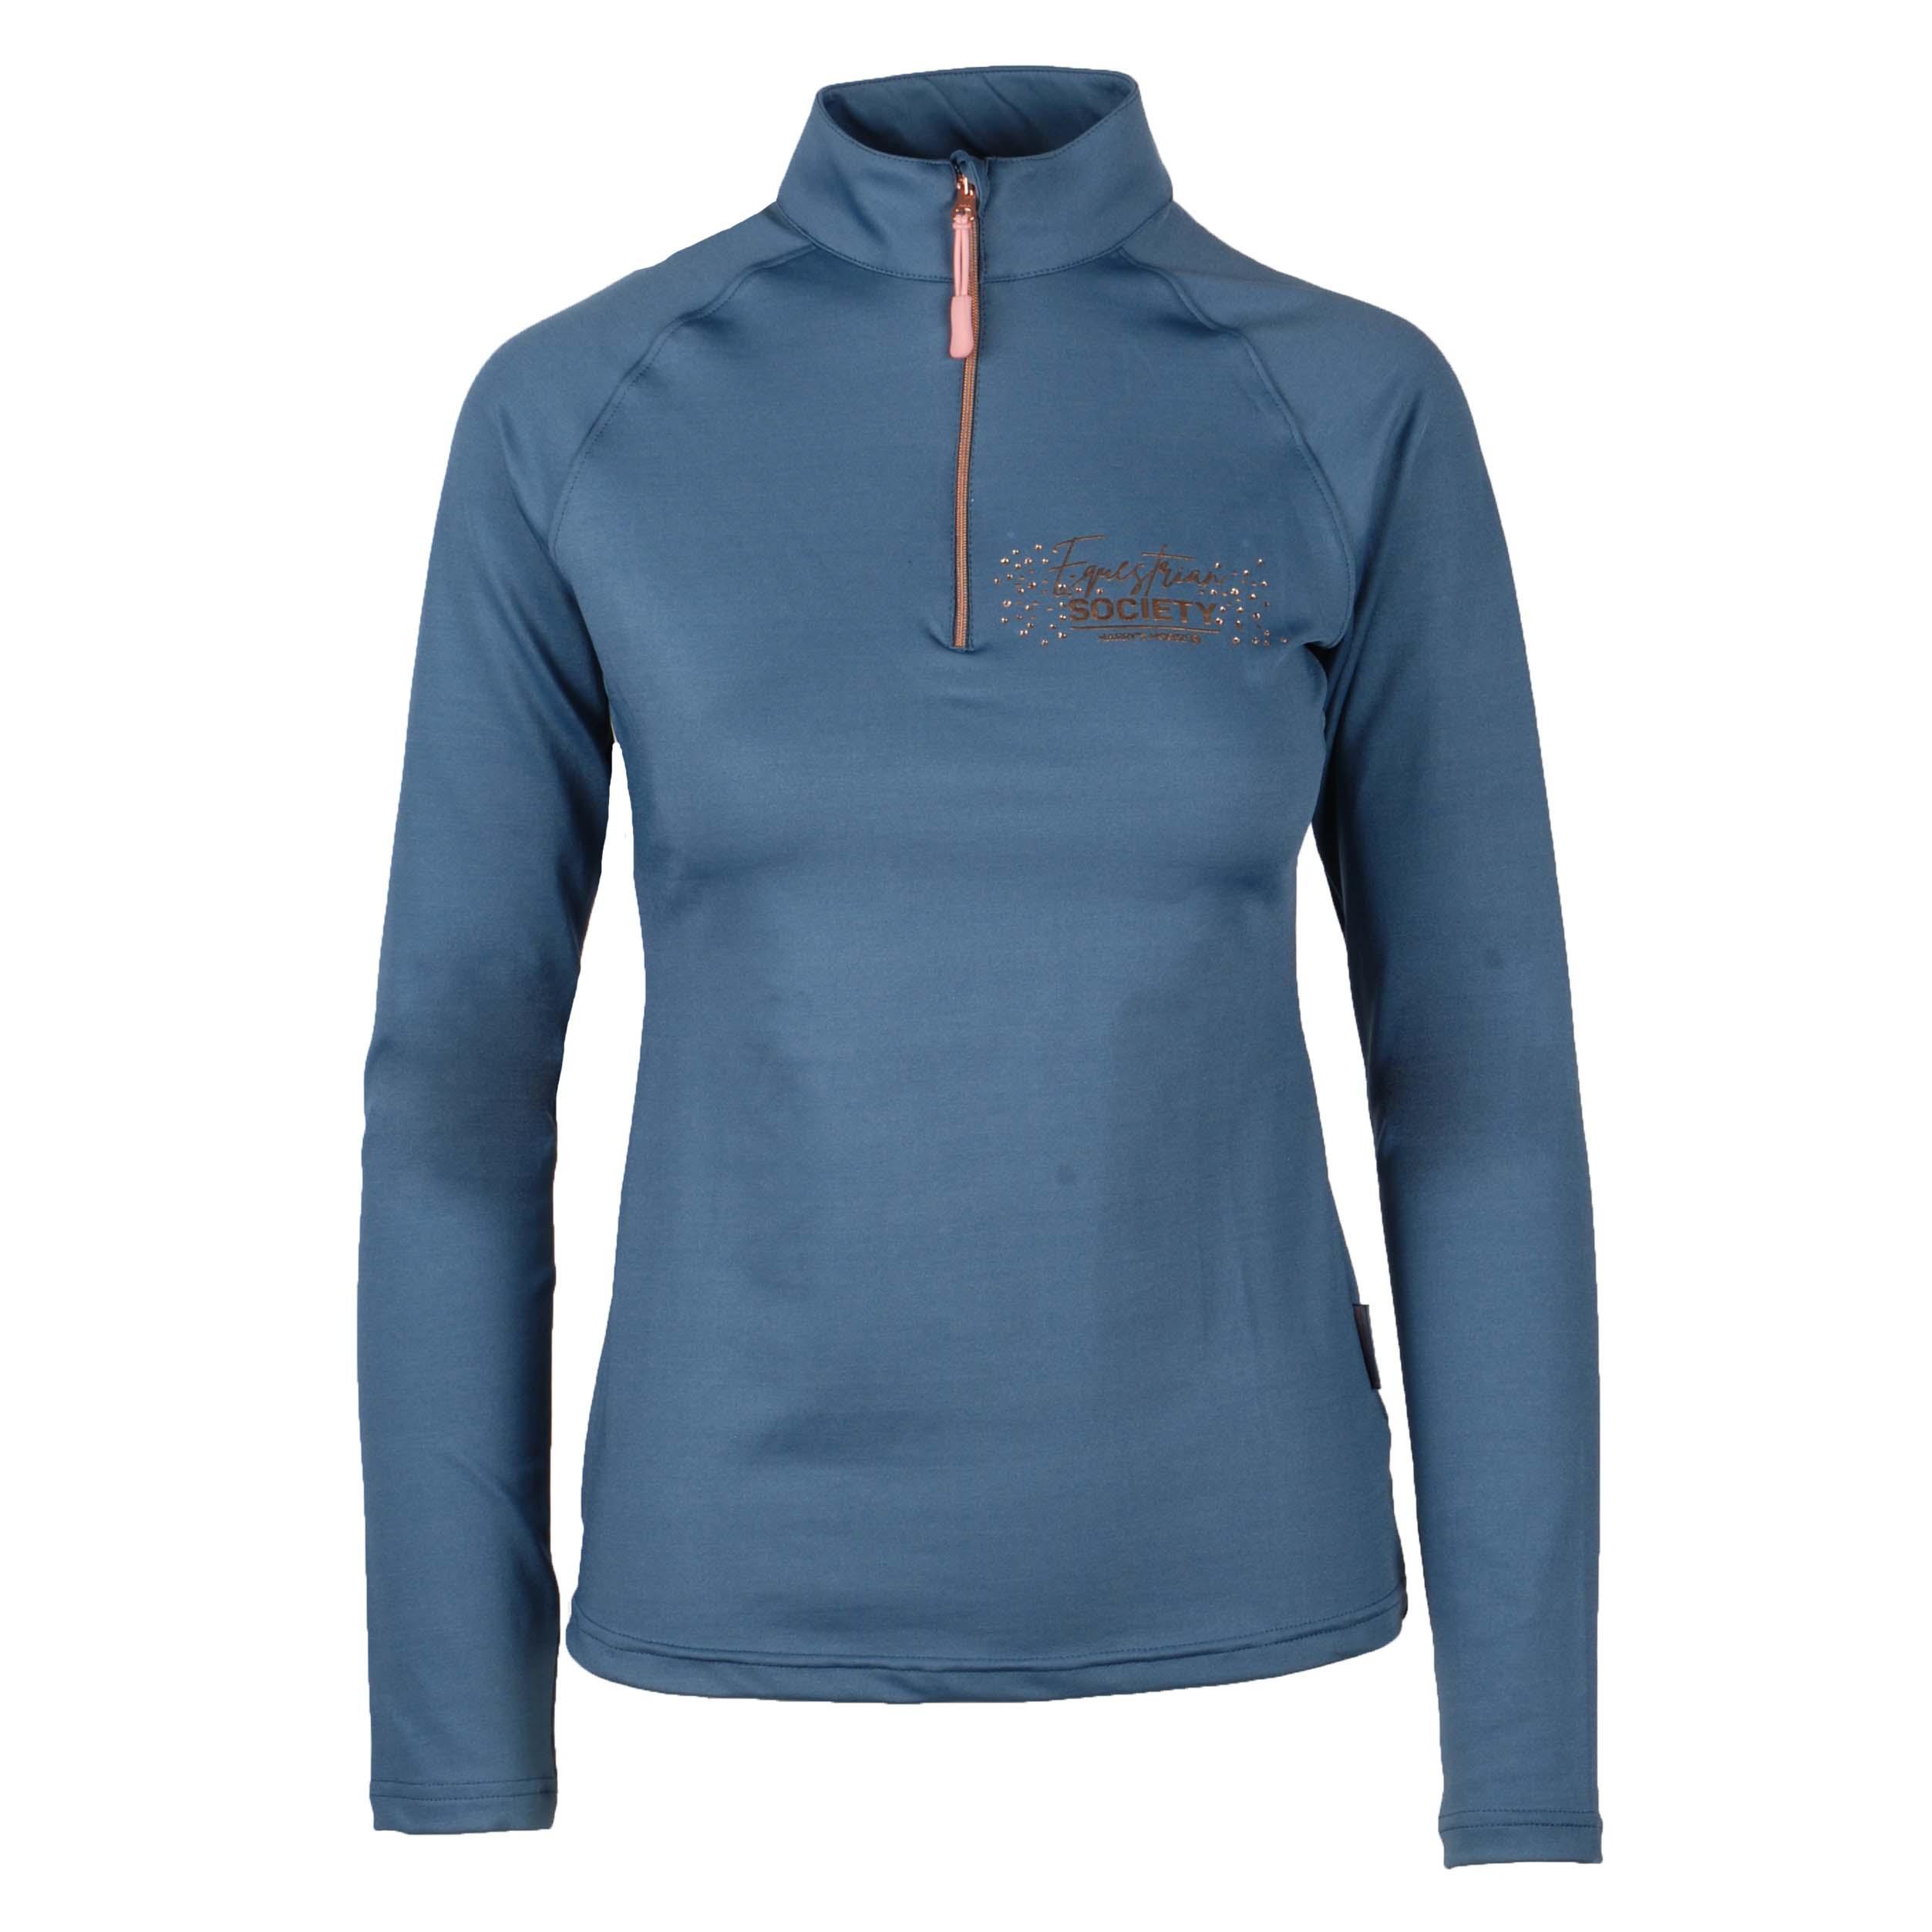 Harrys Horse Queenstown techshirt blauw maat:xl